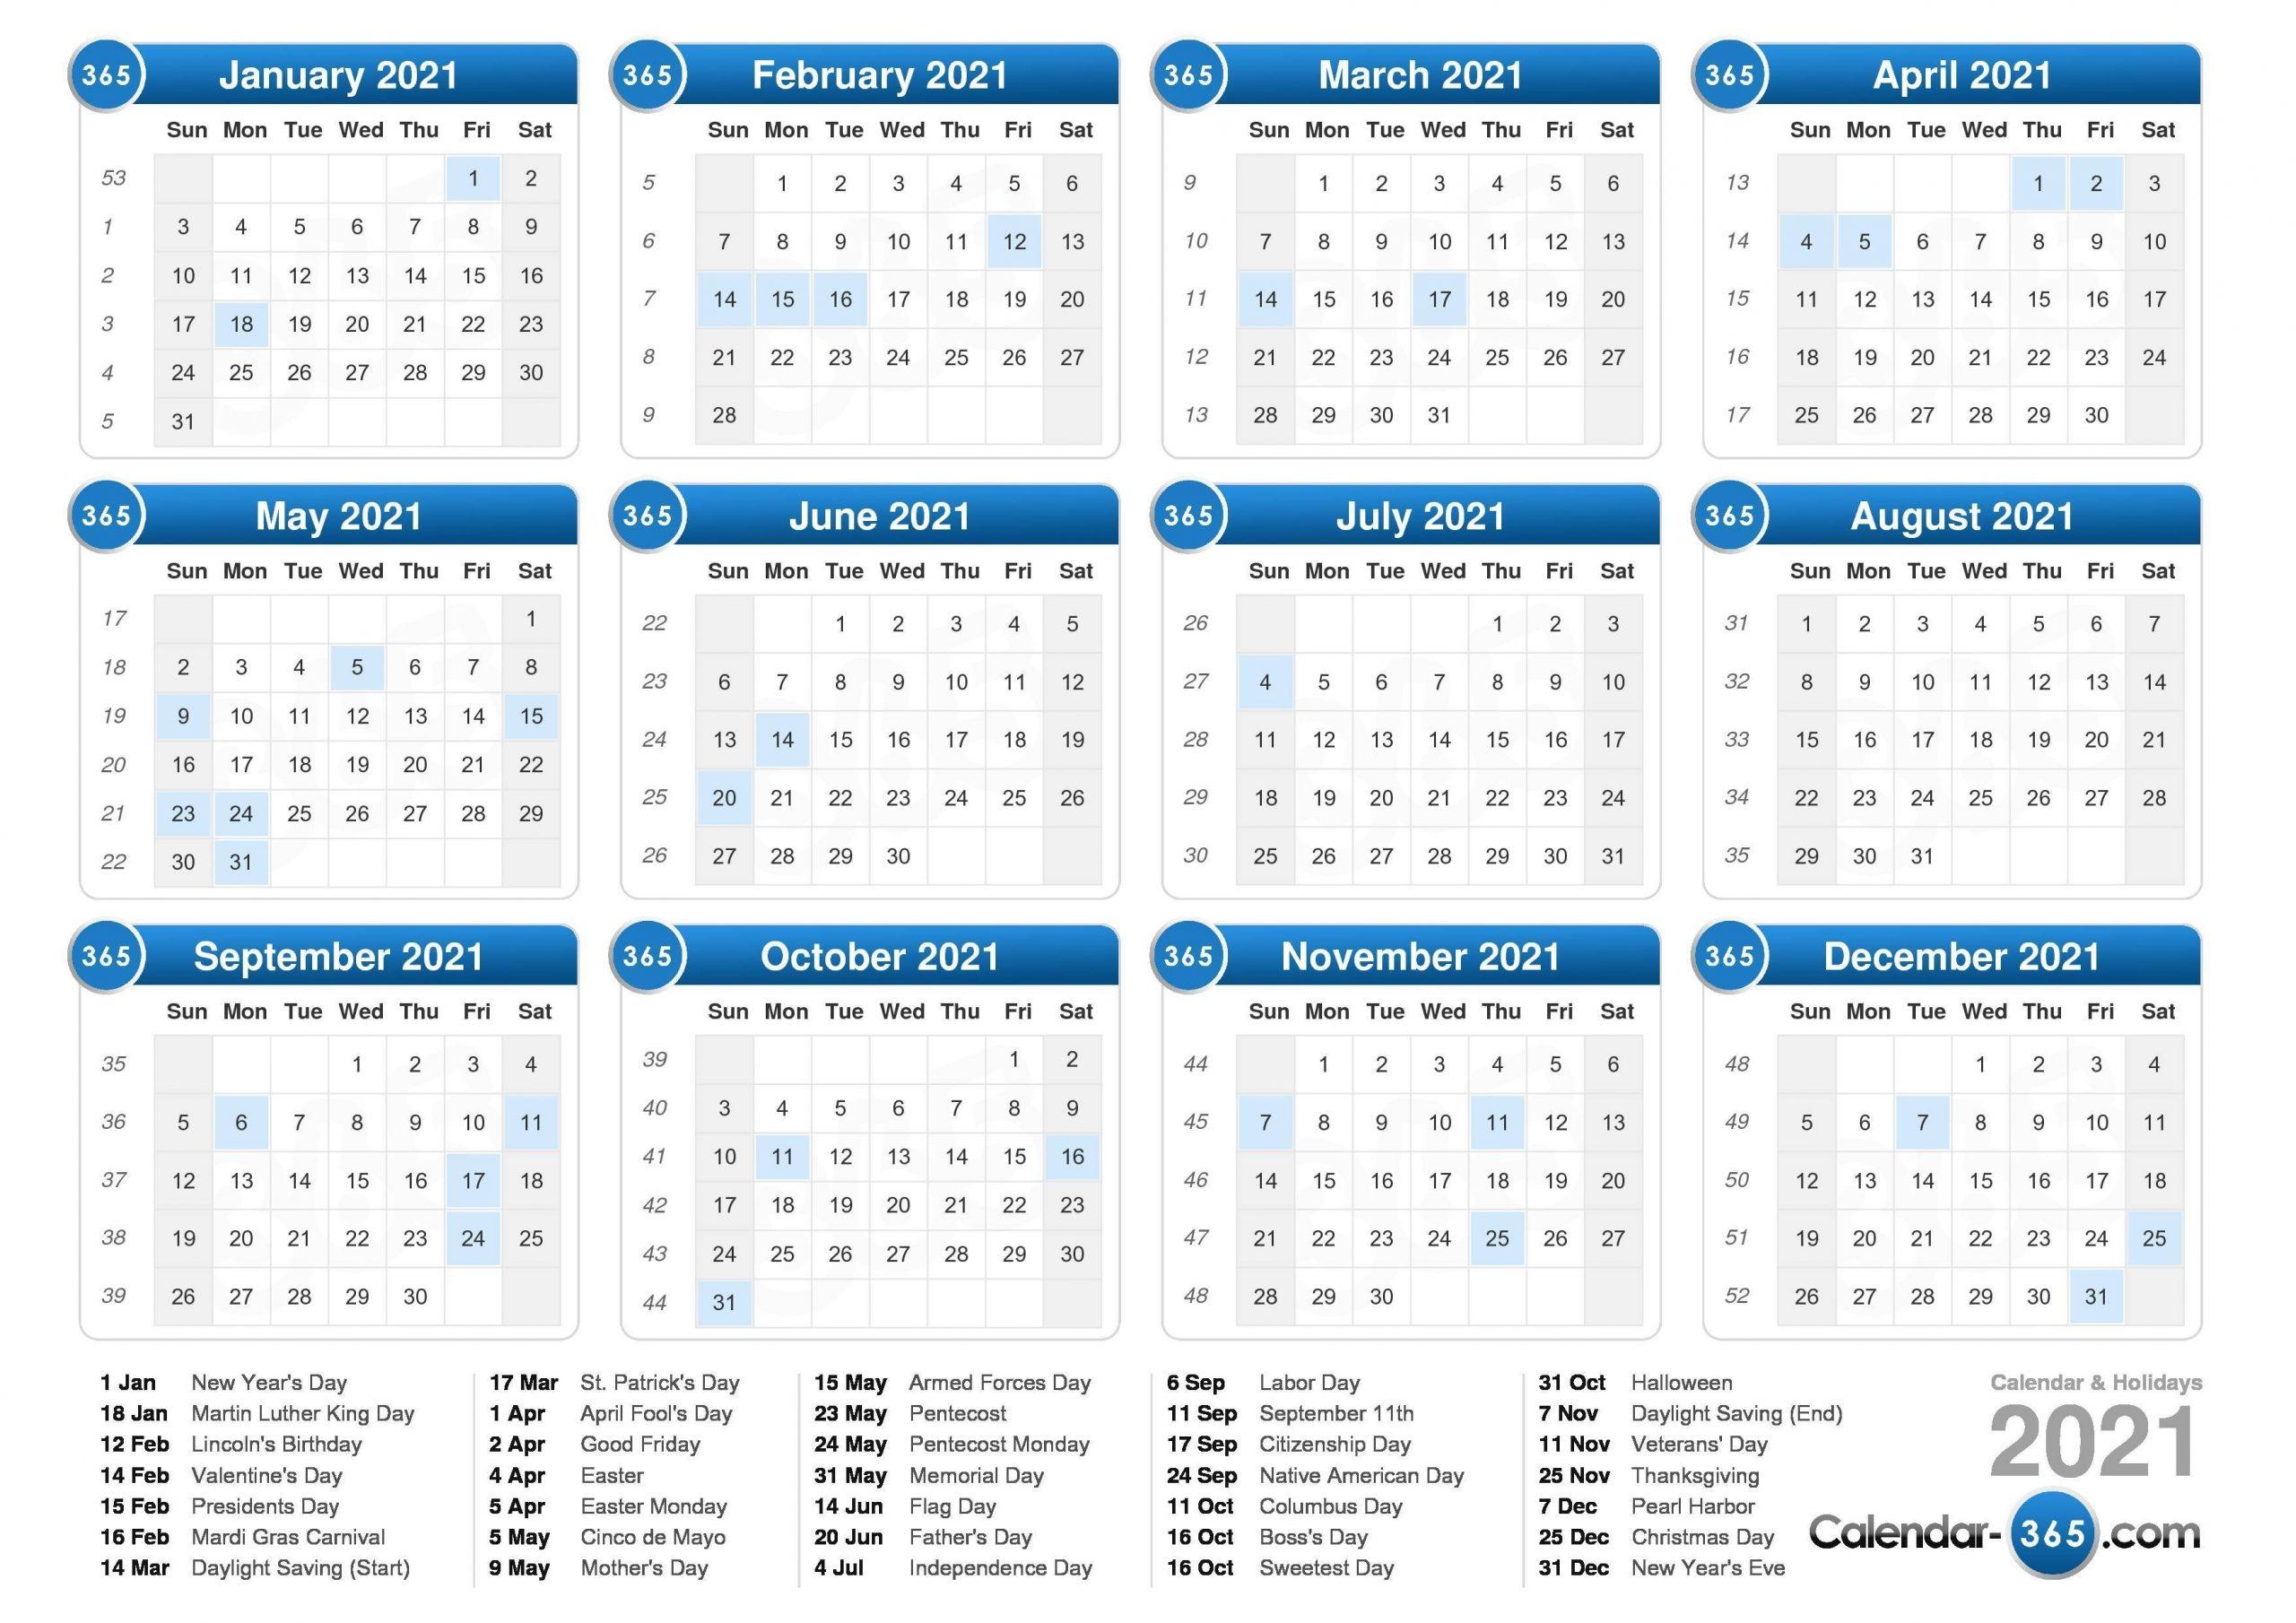 2021 Calendar  2021 Calendar Weeks Numbered